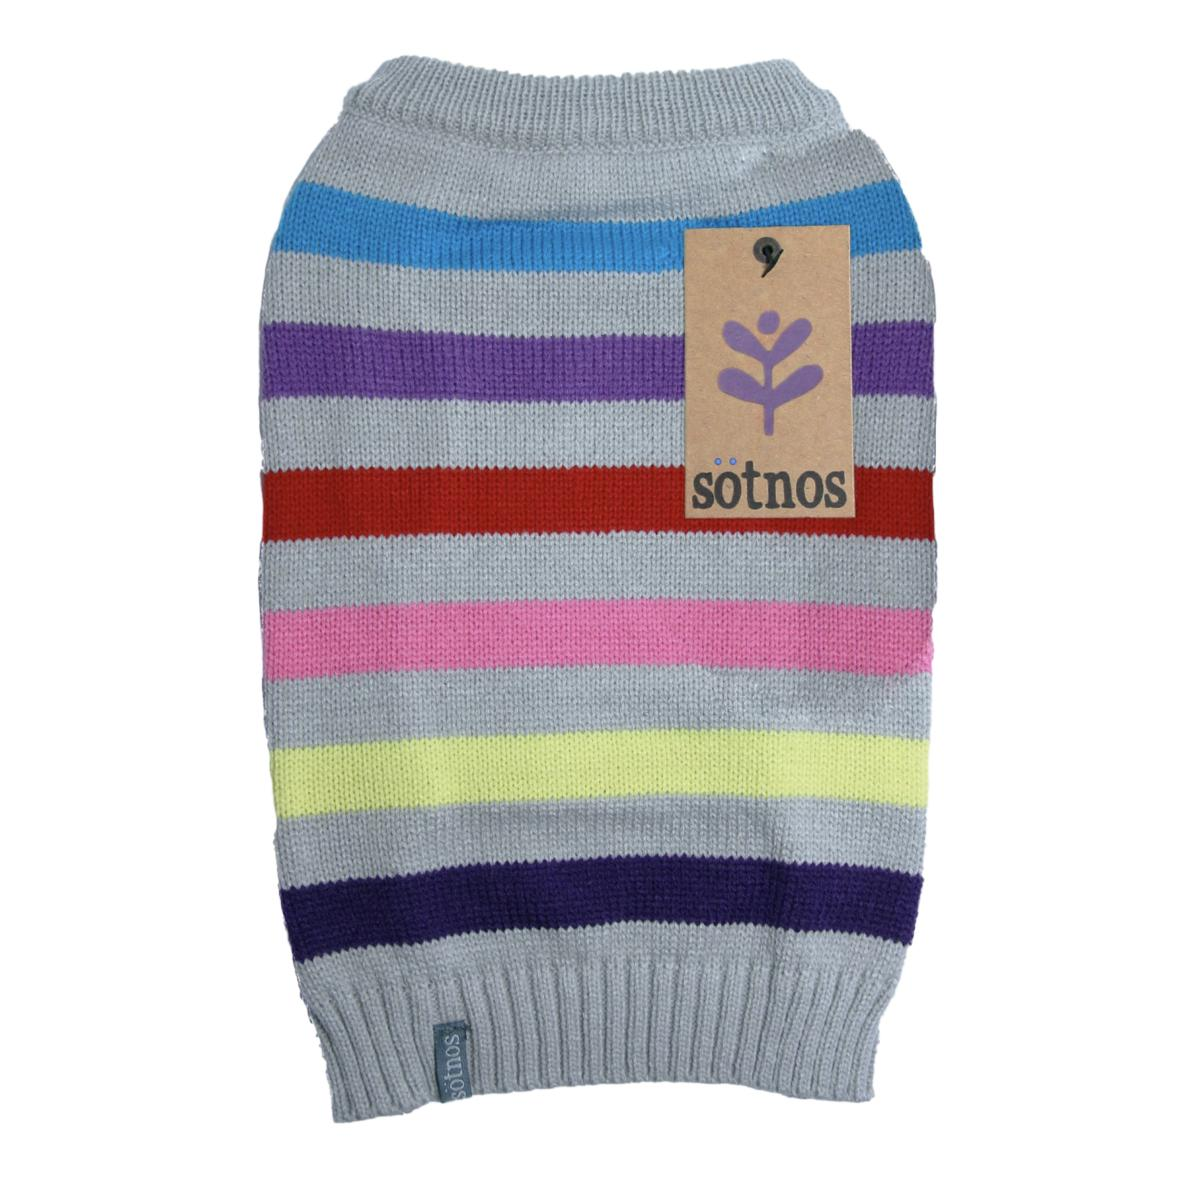 Sotnos Striped Sweater